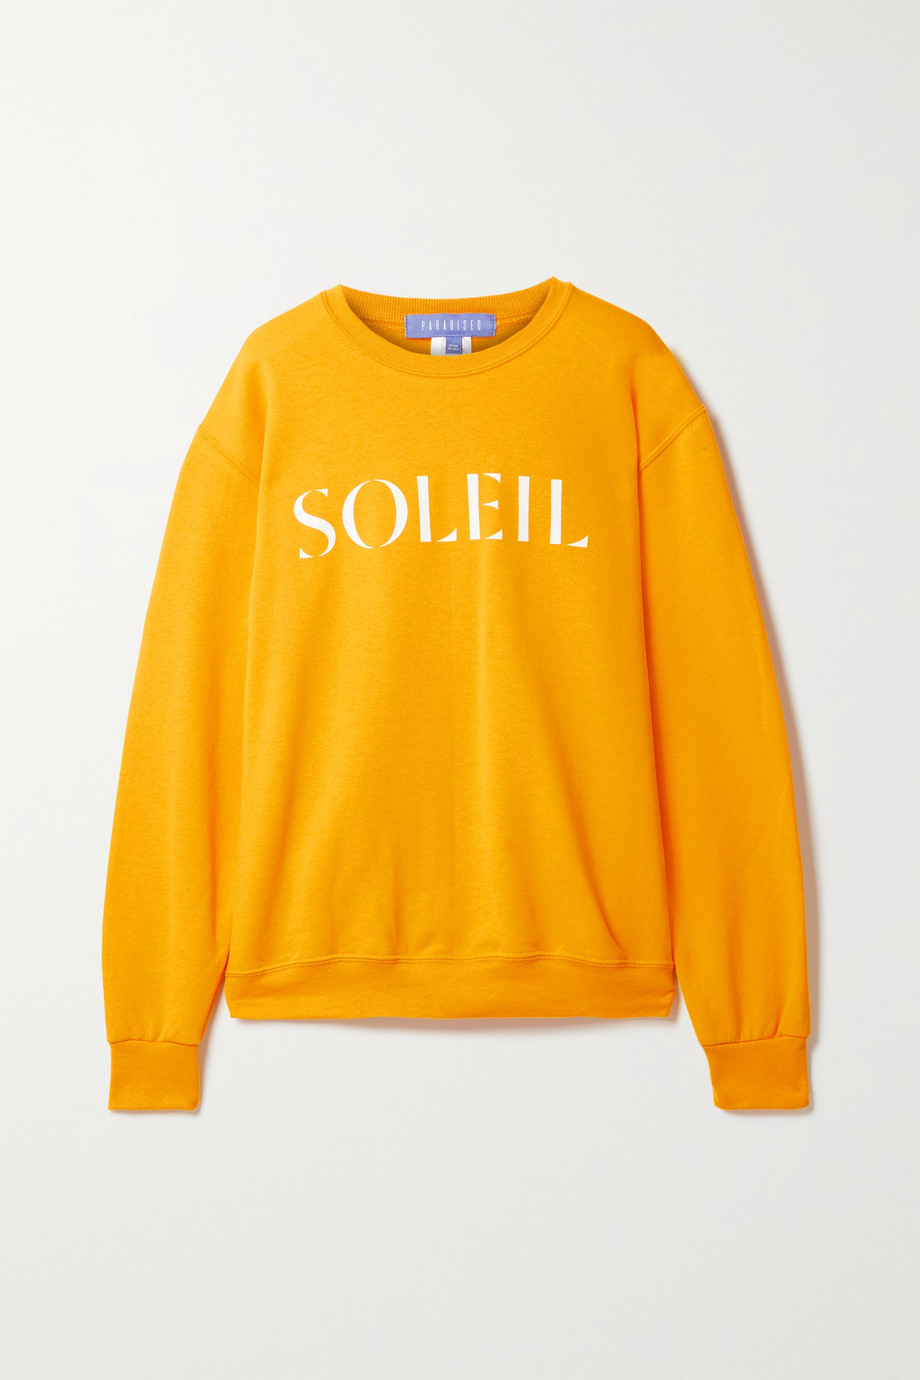 Paradised Printed cotton-blend jersey sweatshirt